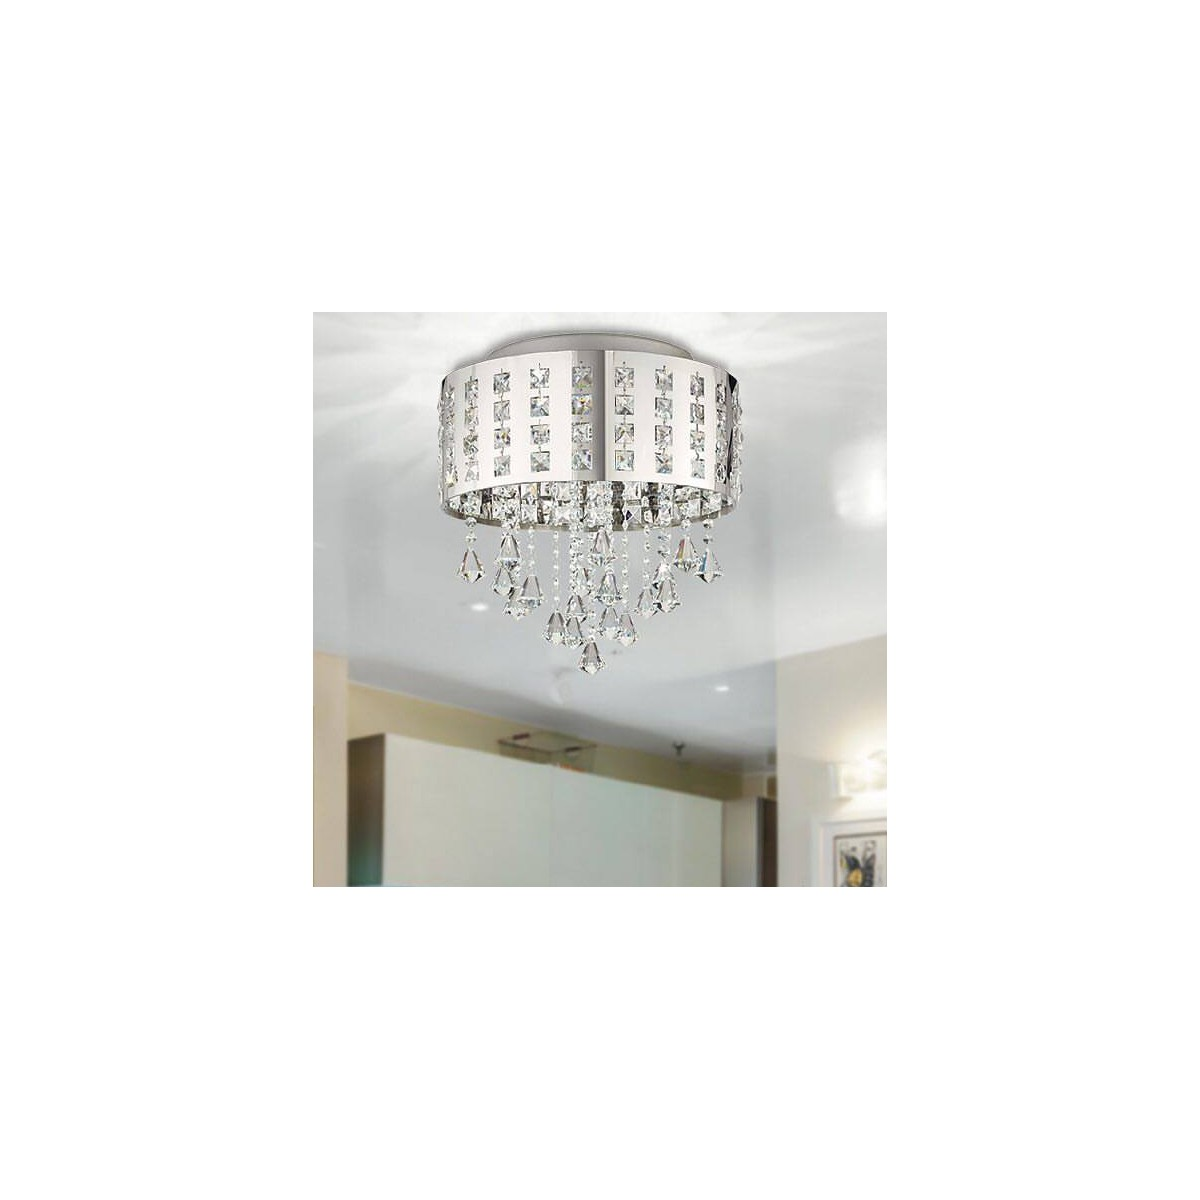 LED-INNUENDO/PL40 - Plafoniera Circolare Metallo Pendenti Cristalli K9 Lampada Moderna Led 24 watt Luce Naturale